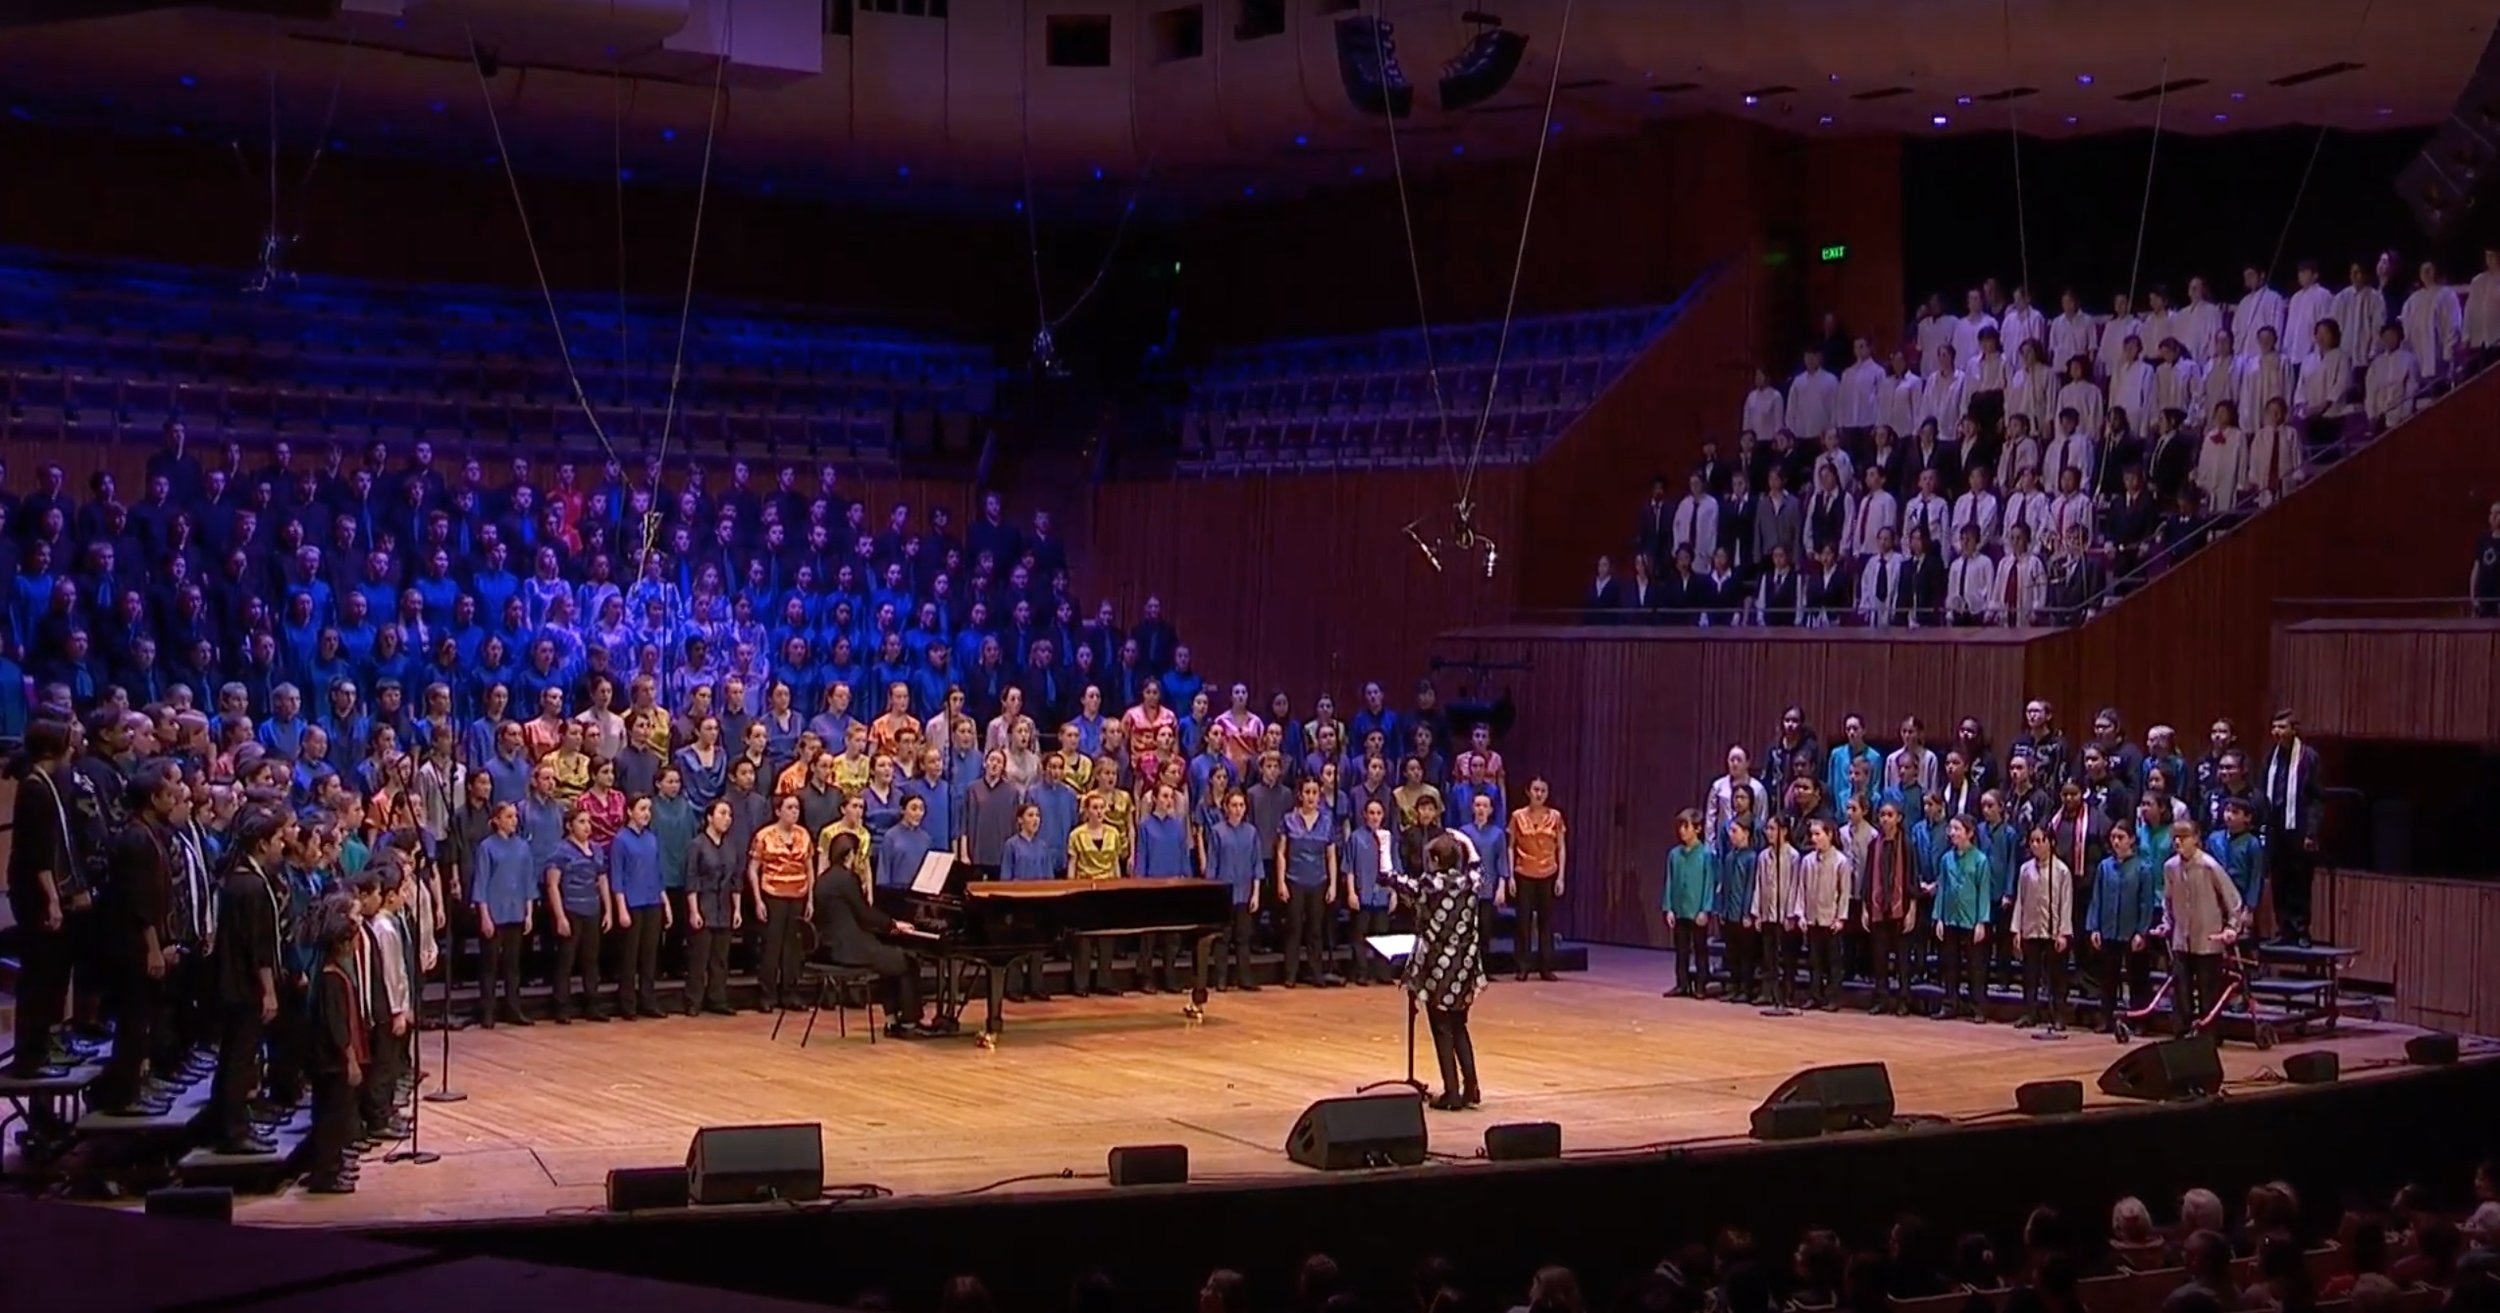 Sounds of Australia - Opening Gala